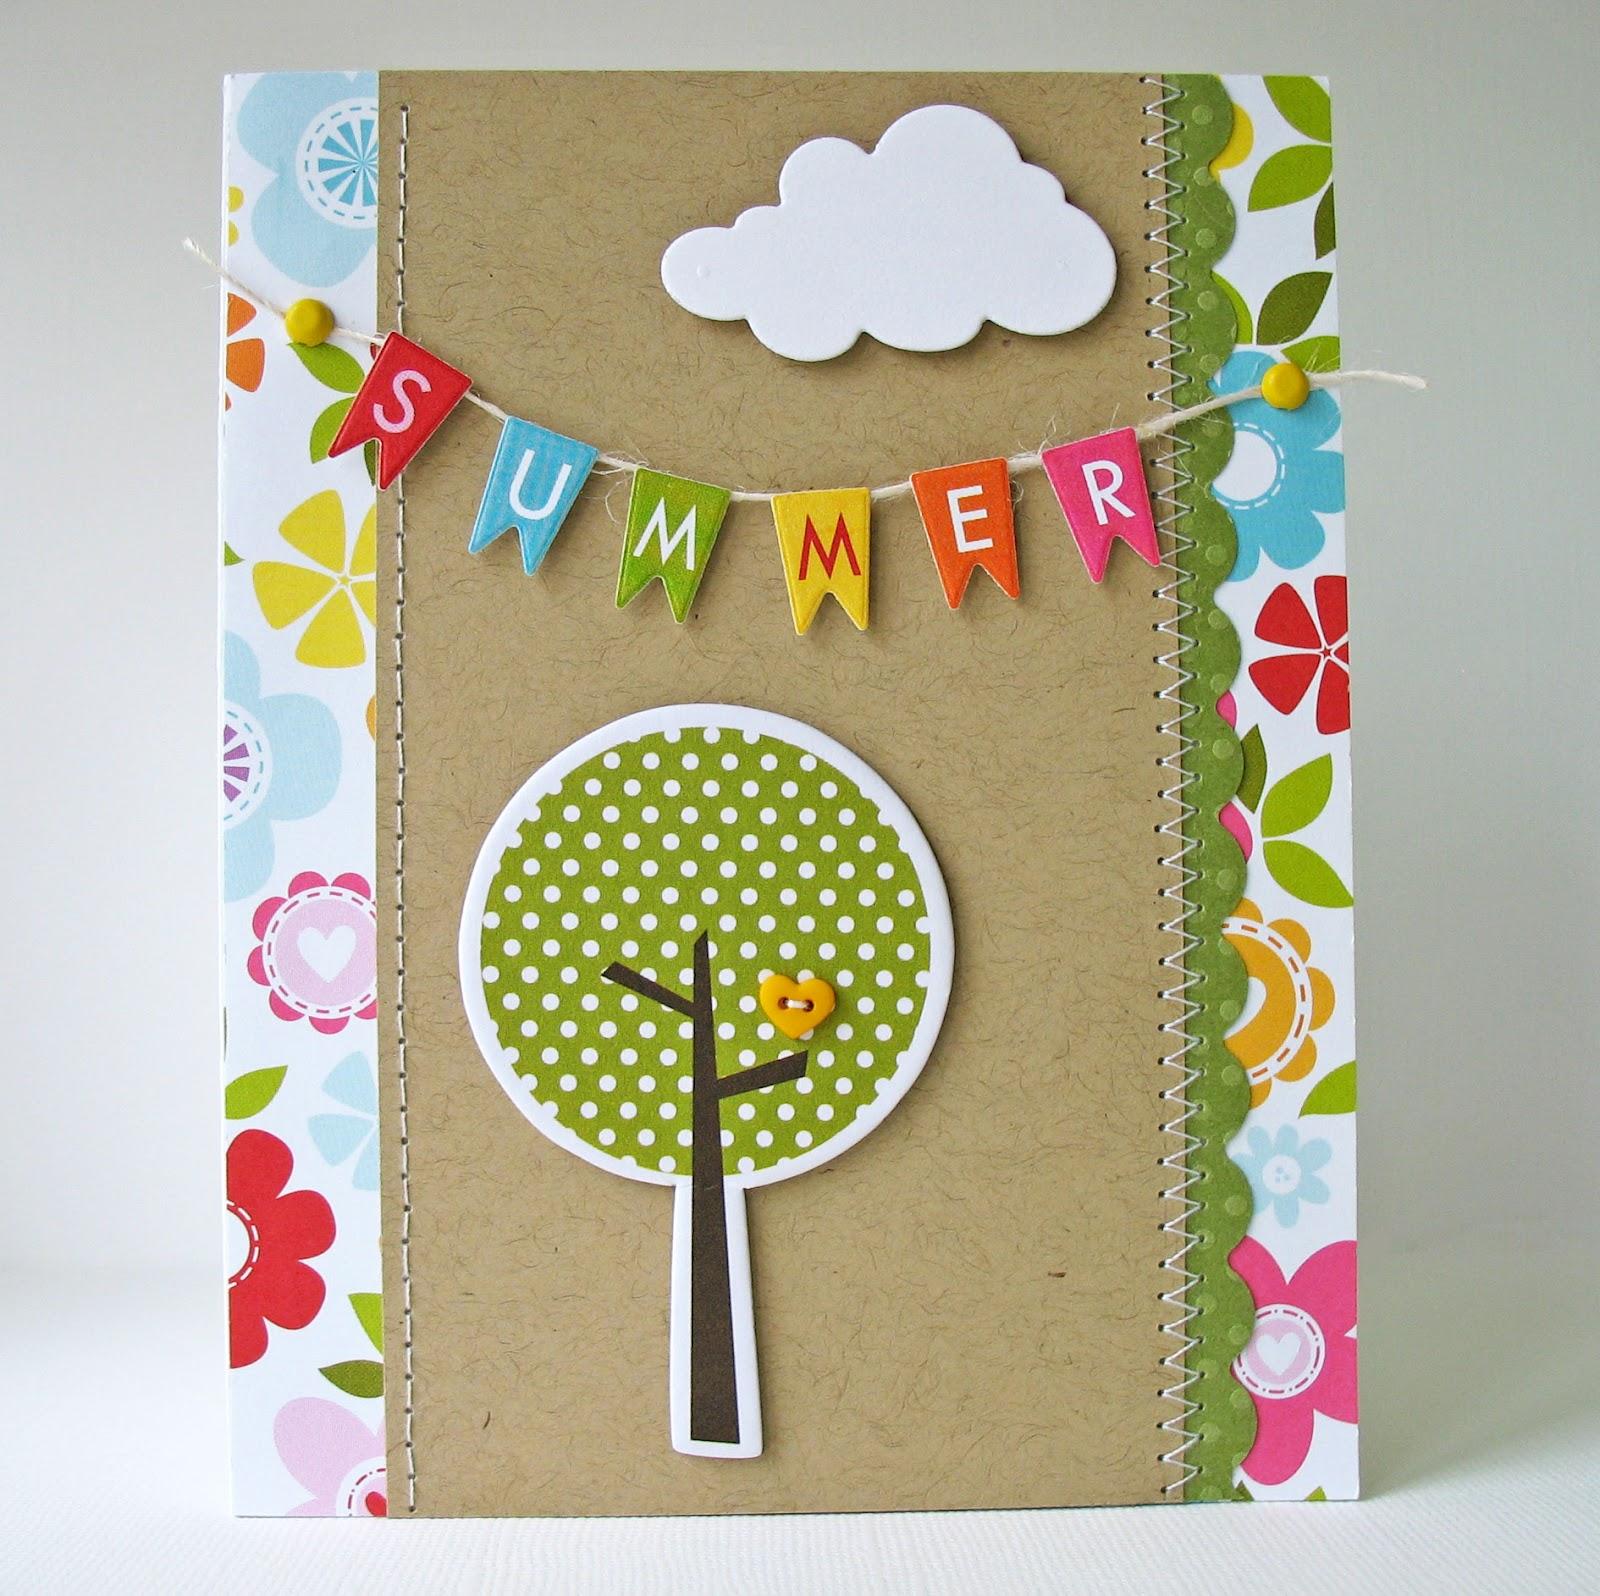 Card Blanc By Kathy Martin Bella Blvd Cards On Thursday